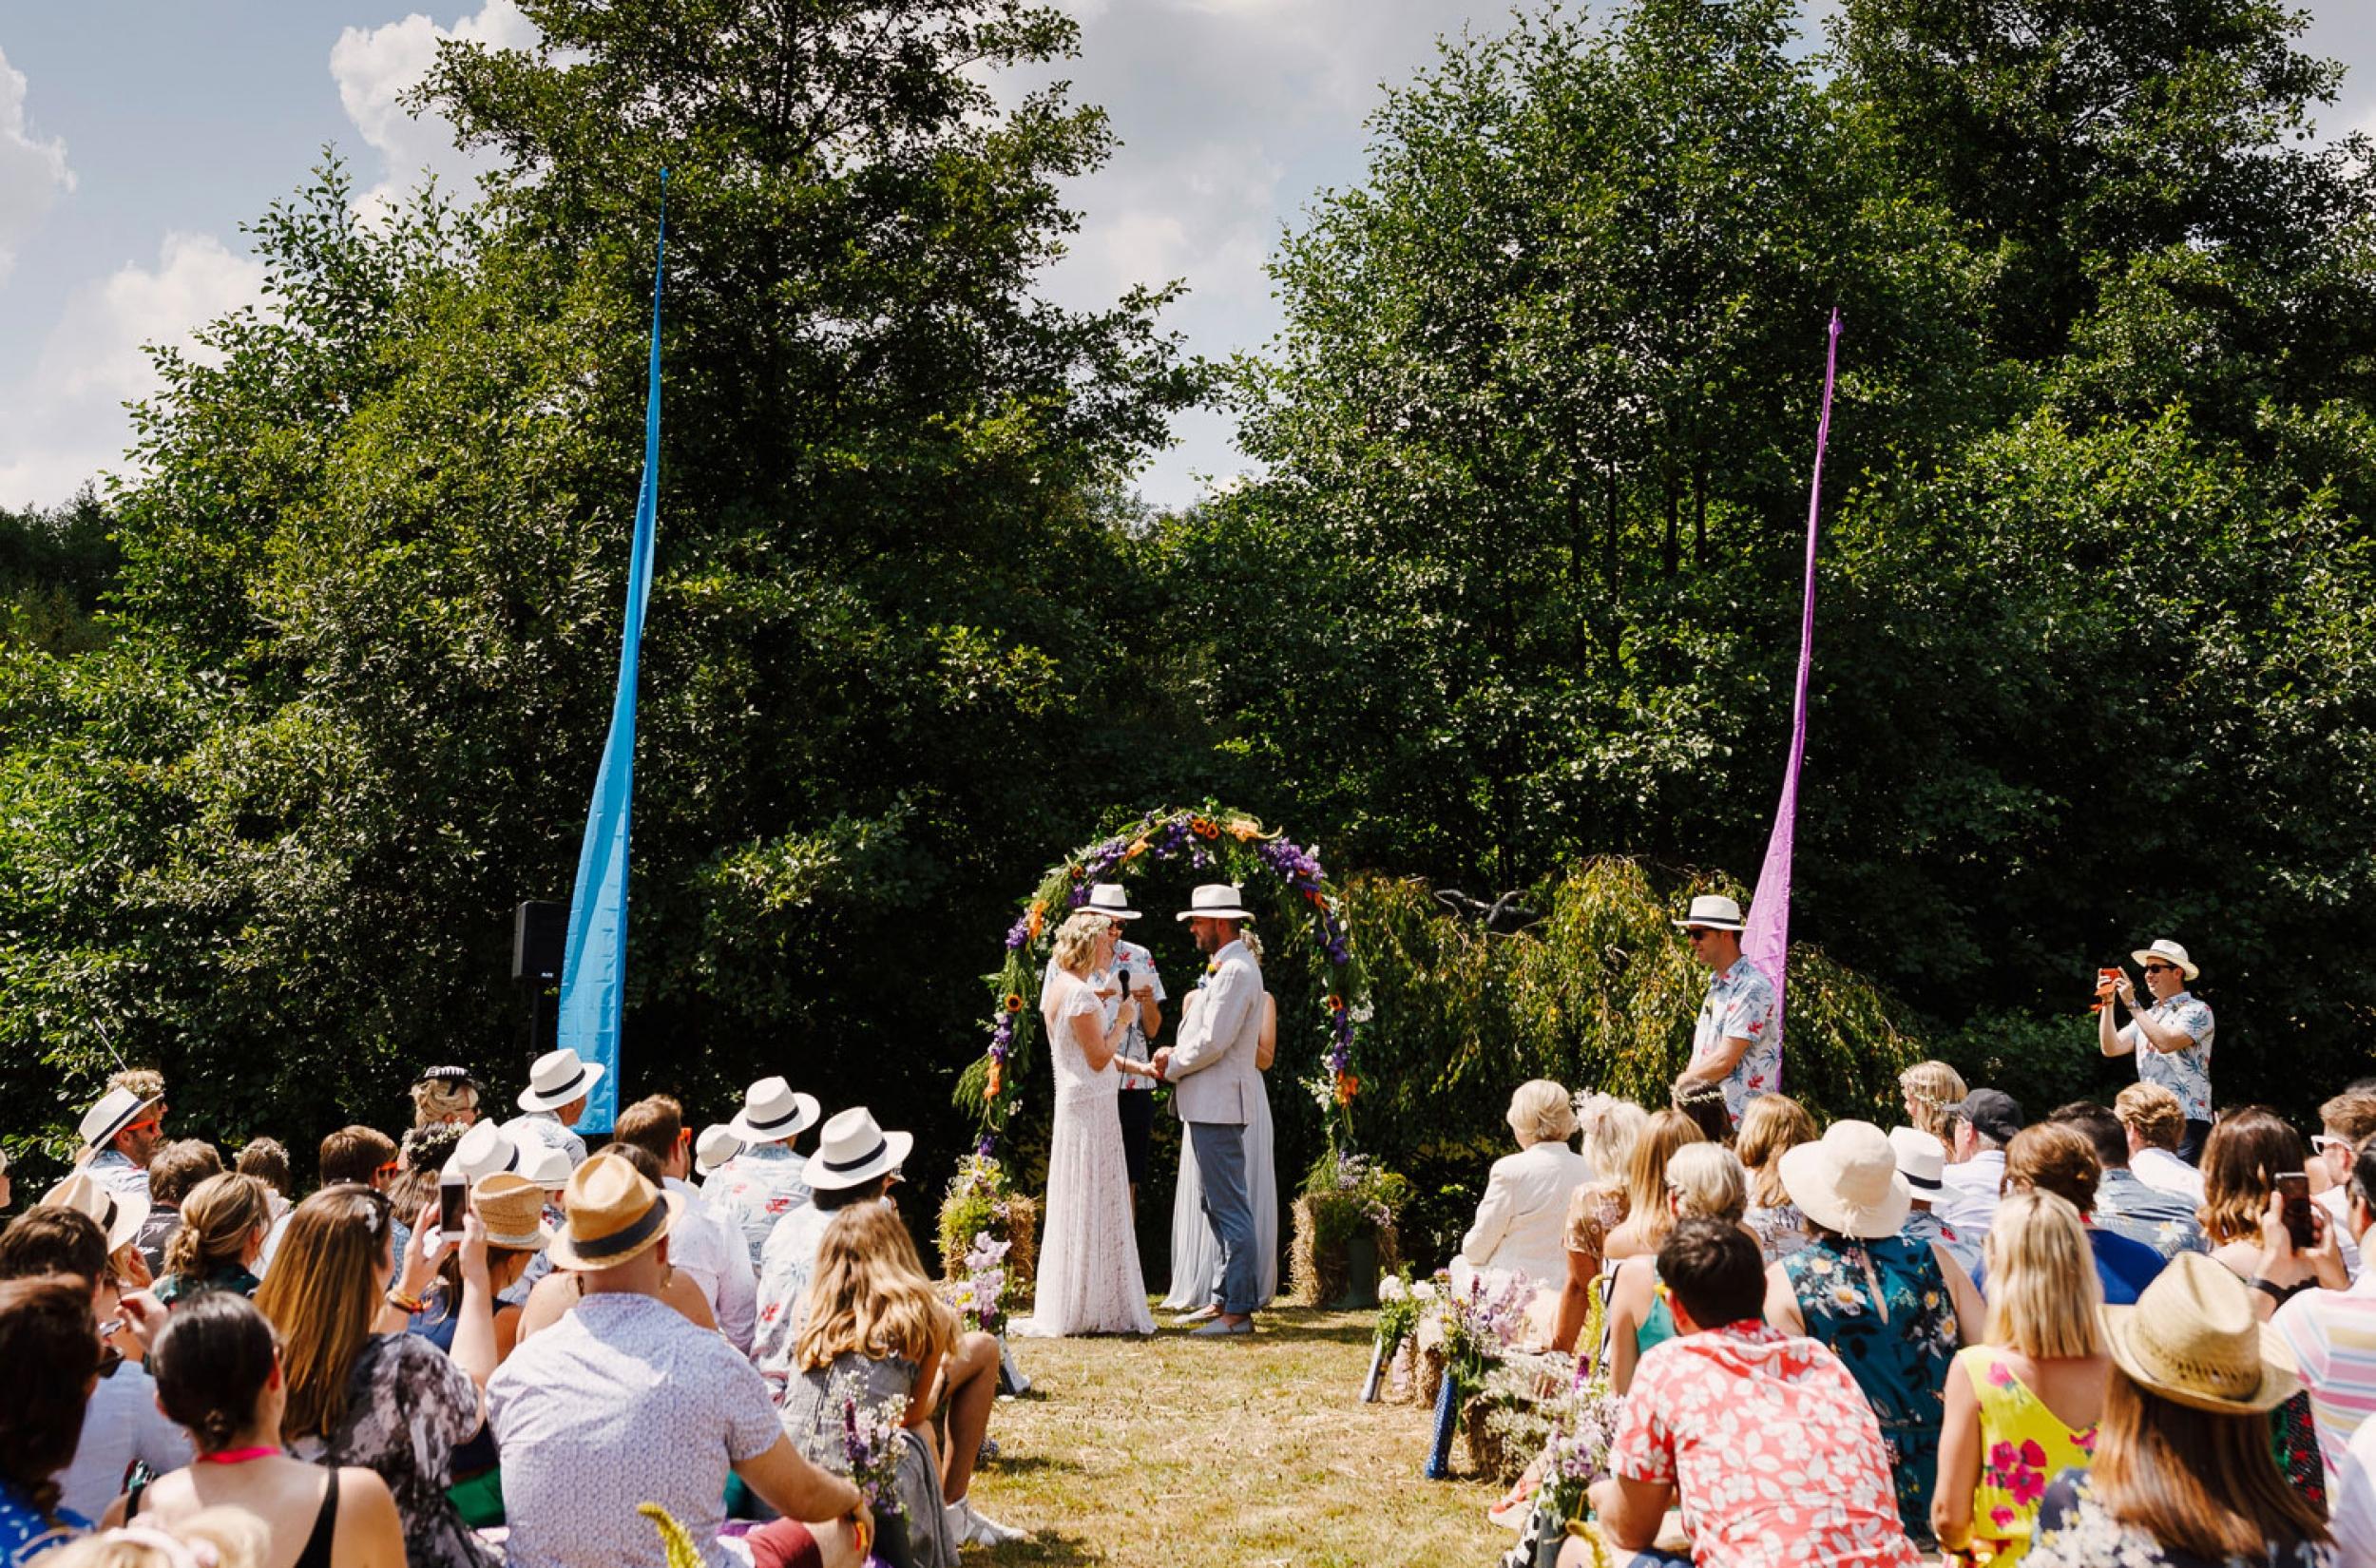 fiesta-fields-outdoor-wedding-events-company-tipi-surrey-sussex-8